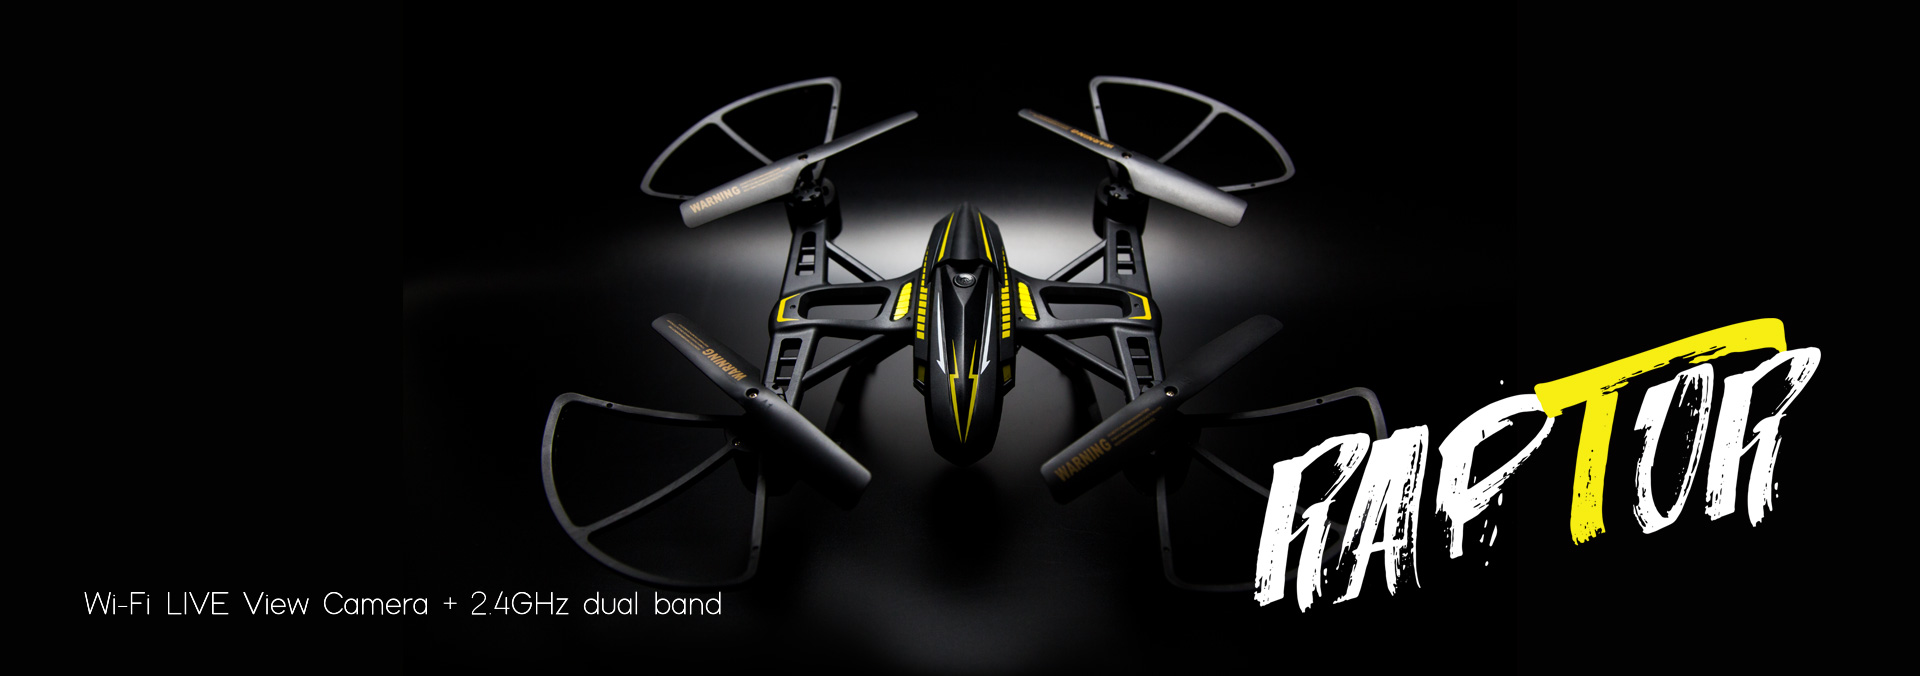 Raptor drone main-2